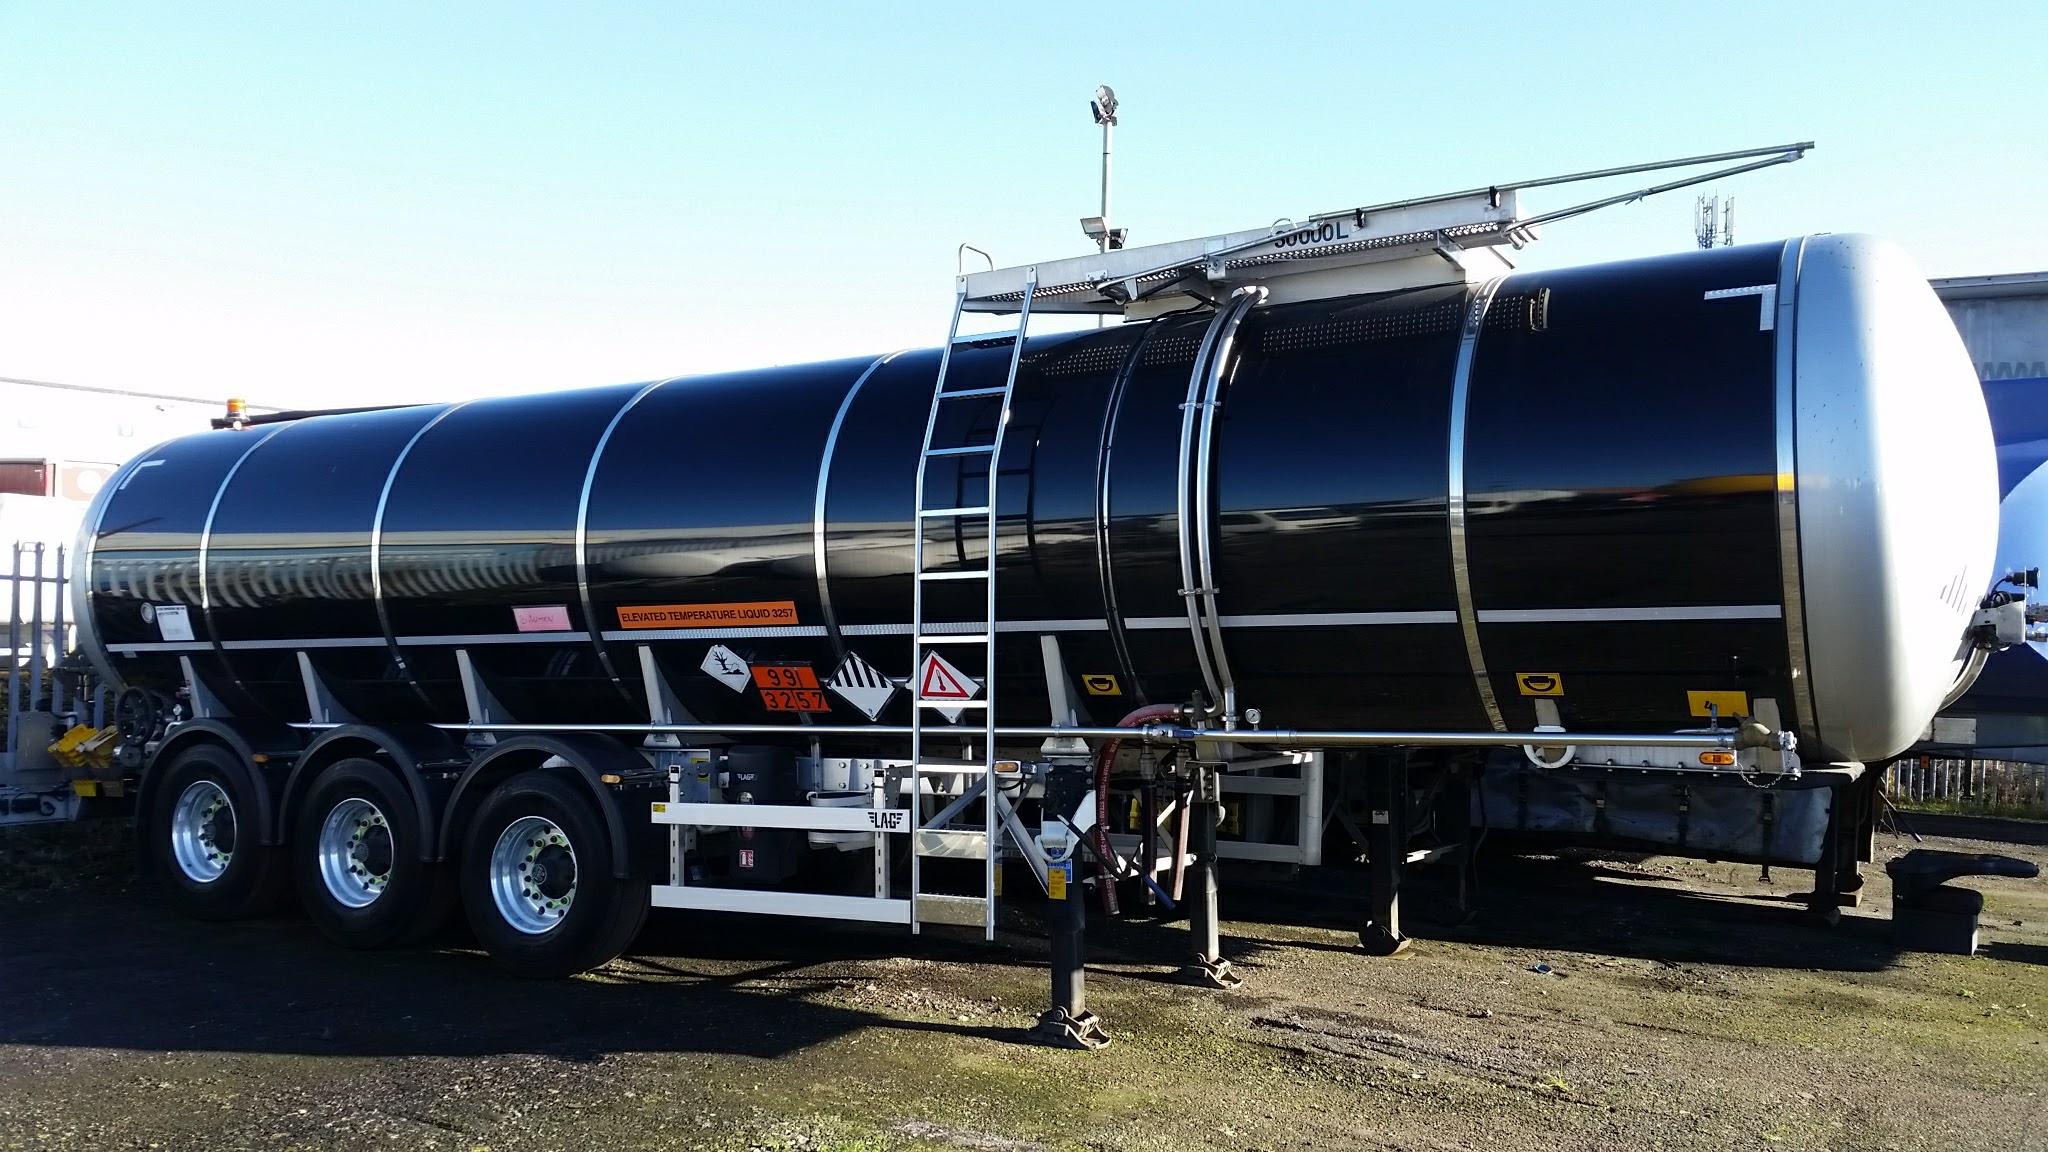 10000l 4x2 Dongfeng Flammable Liquid Tank Truck Transport